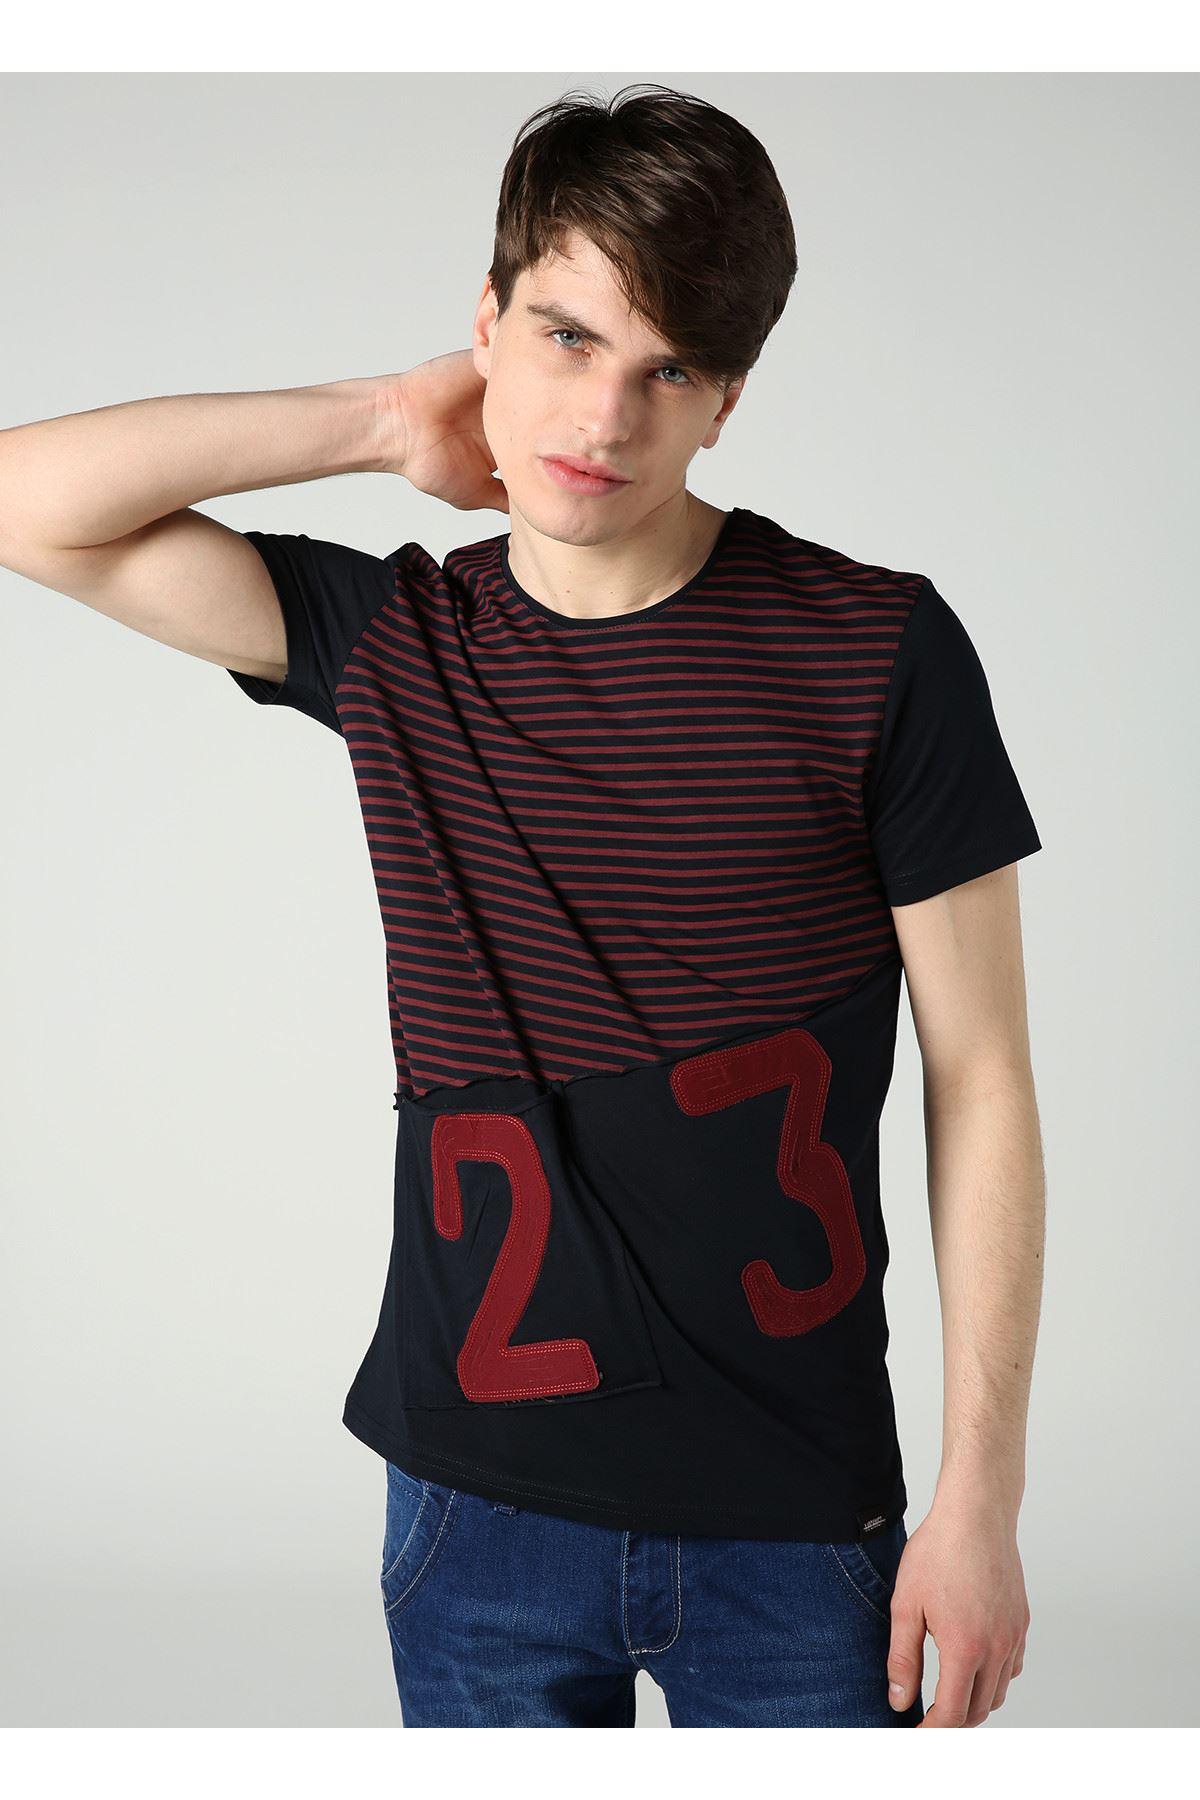 Bisiklet Yaka Çizgi Baskılı Erkek Lacivert T-Shirt